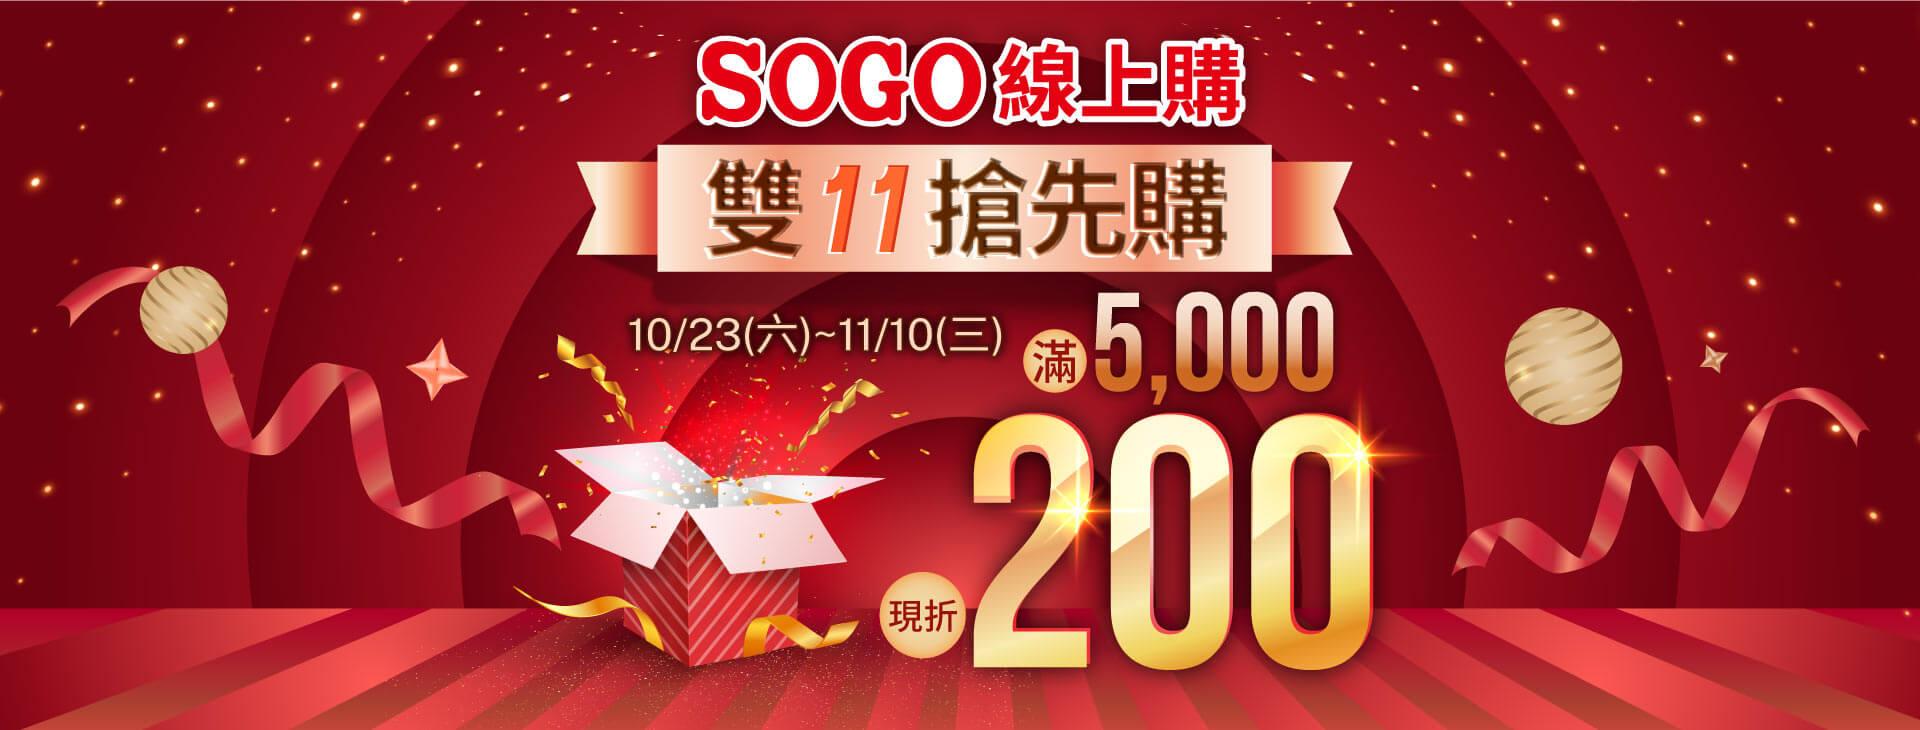 SOGO線上購「雙11搶先購滿$5000現折$200」